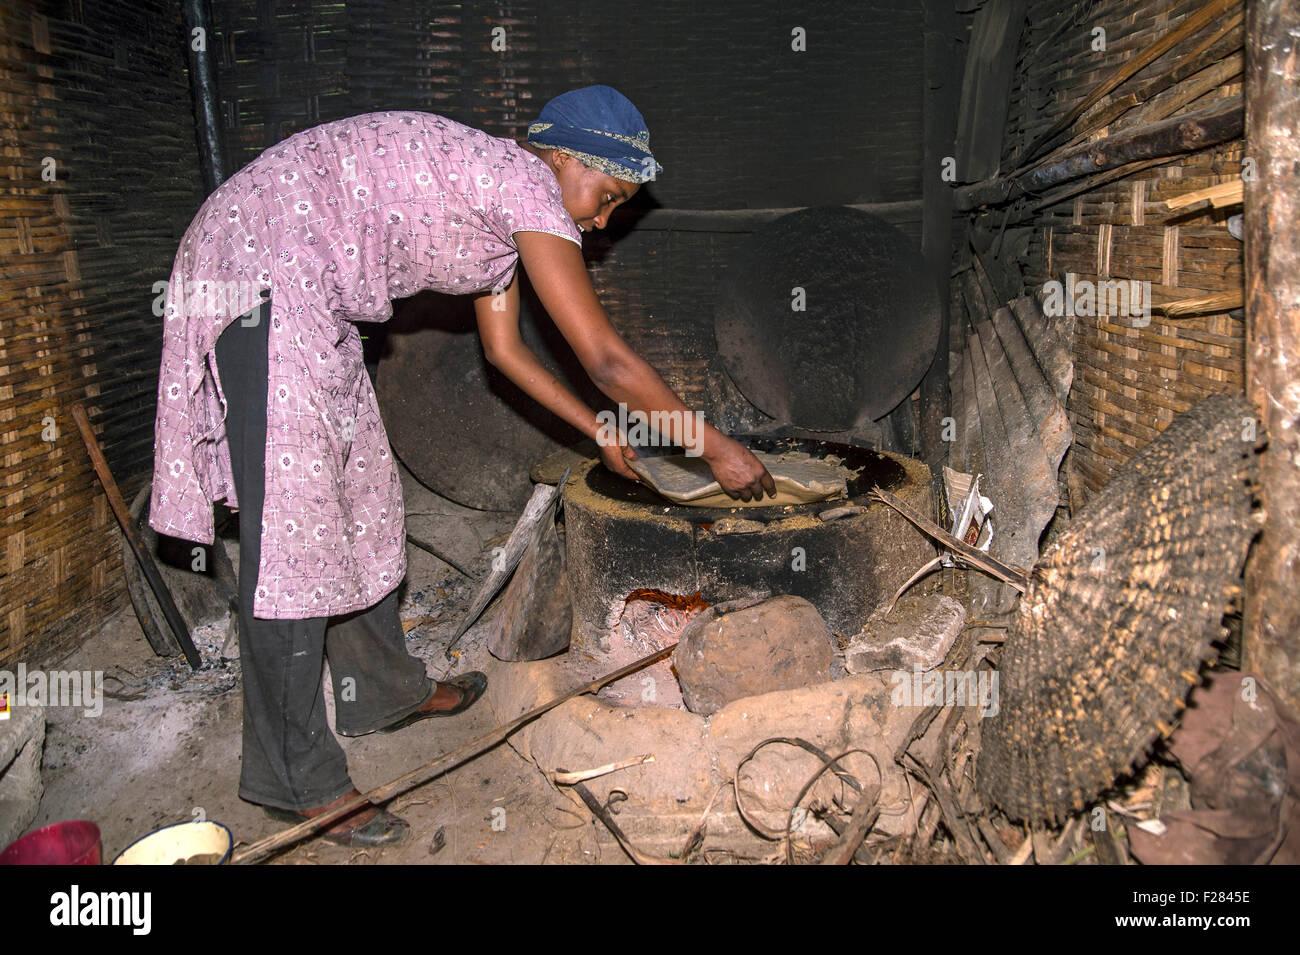 Young Ethiopian woman preparing Injera, the traditional Ethiopian flatbread, Oromiya, Ethiopia - Stock Image